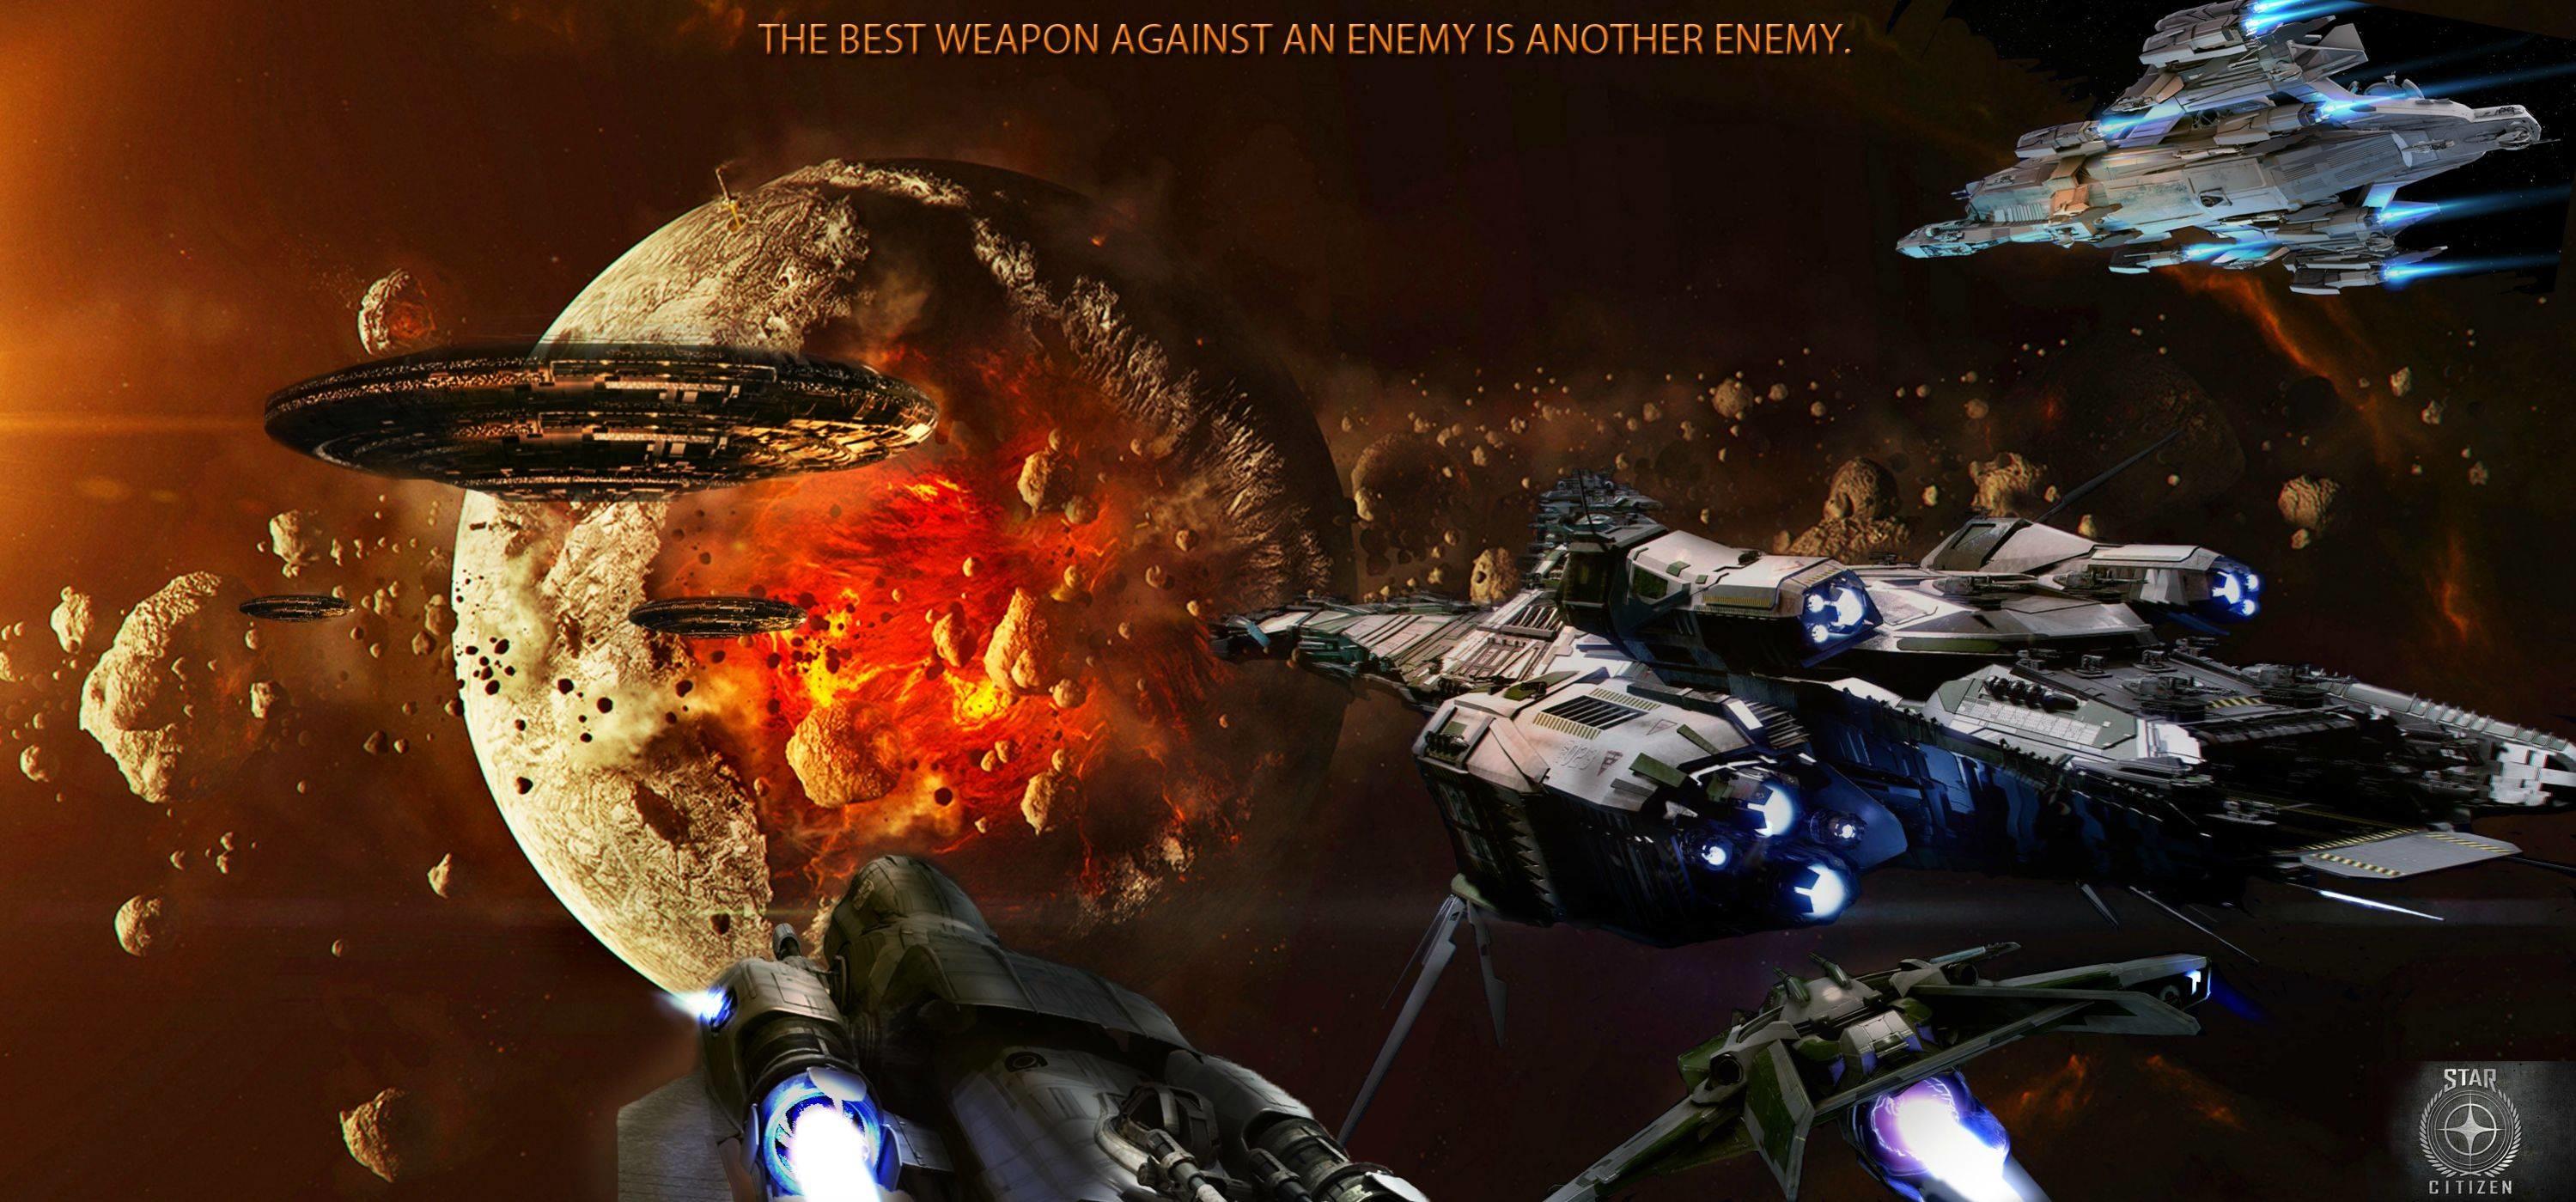 Res: 2999x1399, STAR CITIZEN sci-fi spaceship game space battle h wallpaper |  |  167655 | WallpaperUP